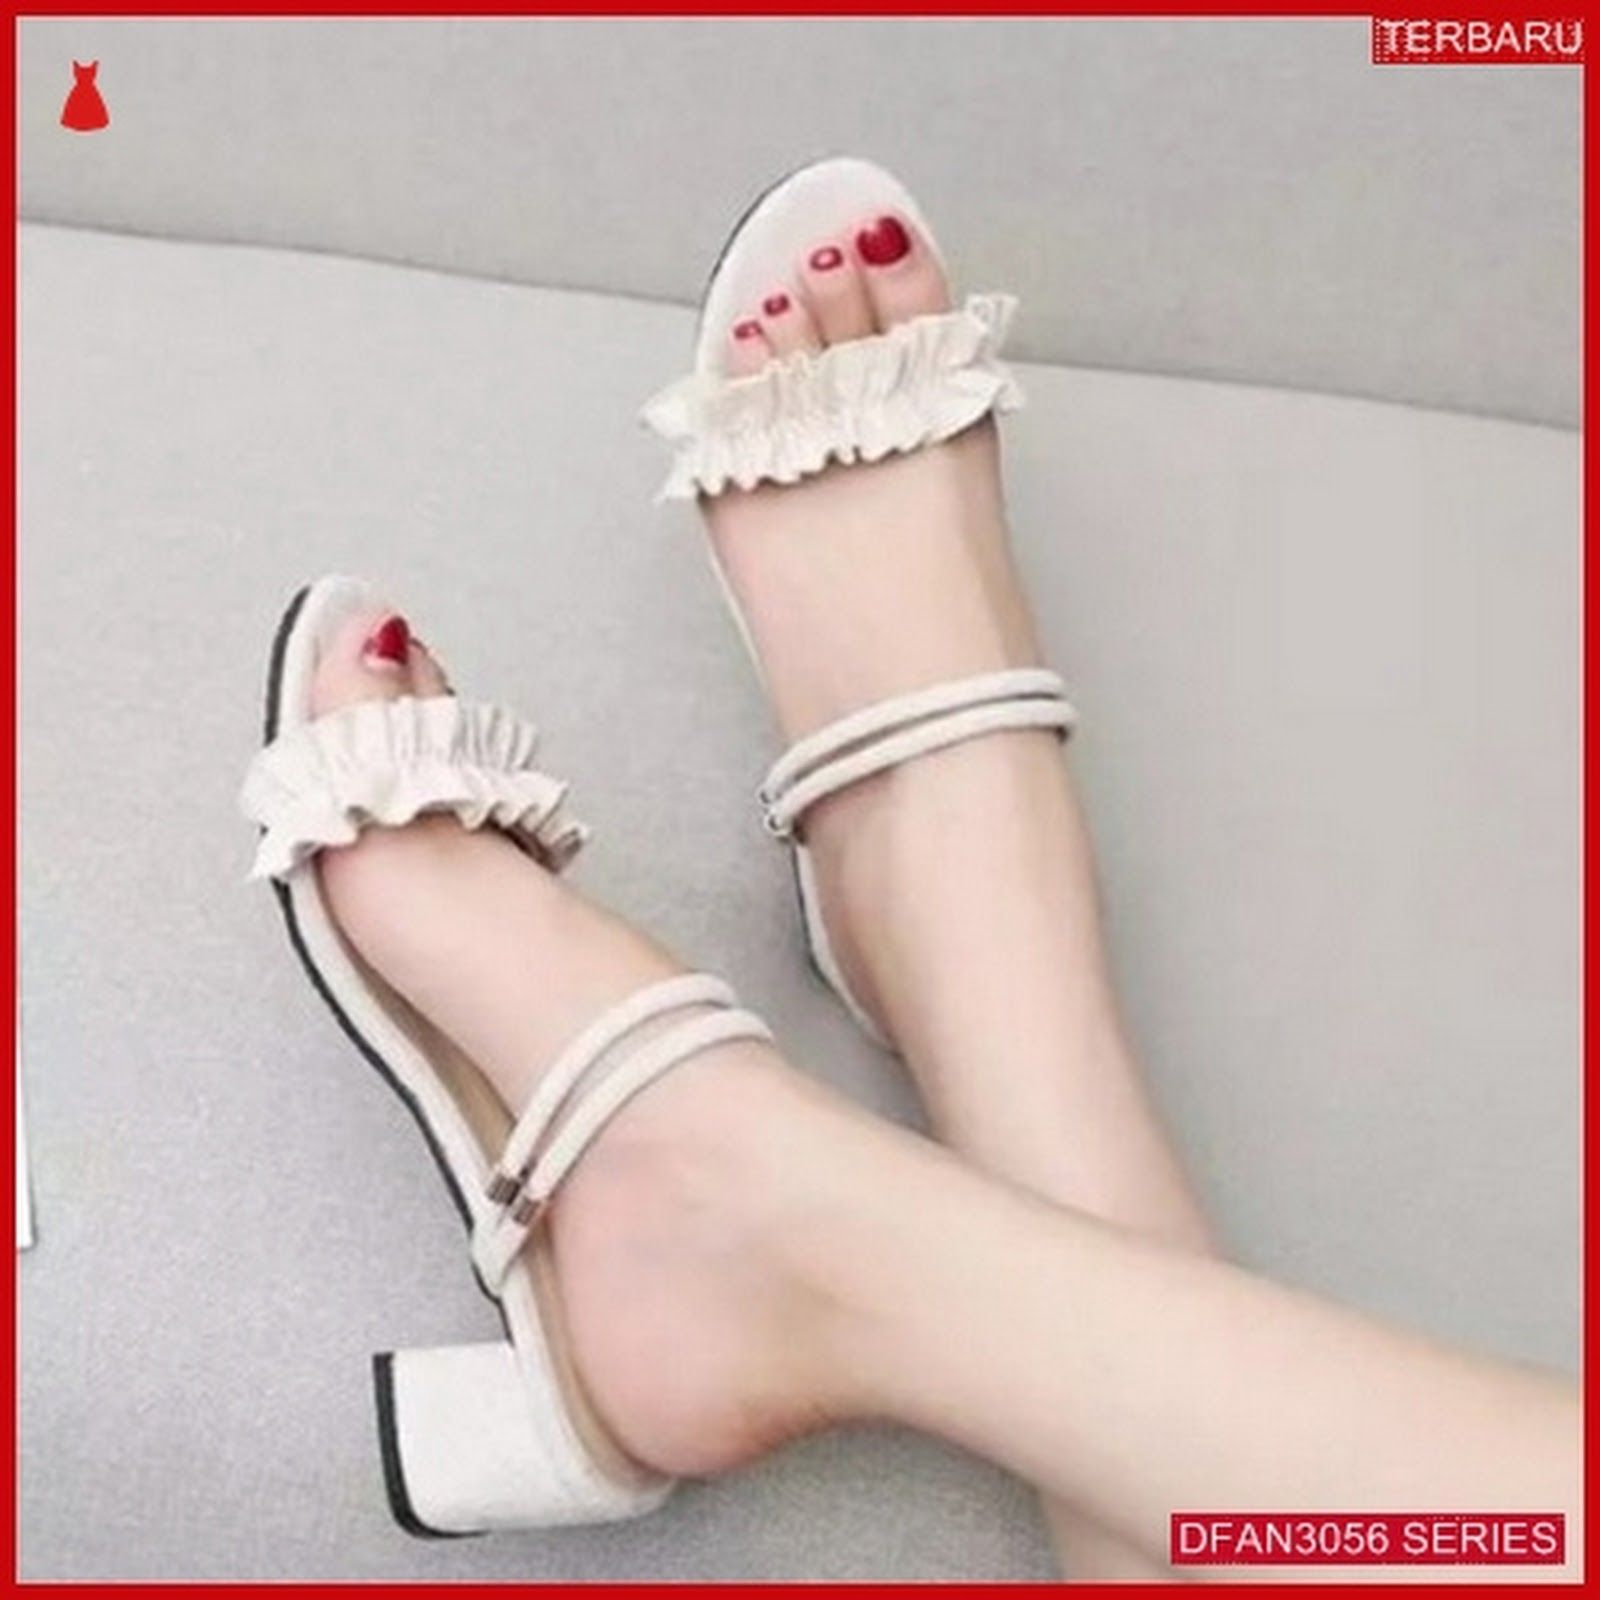 DFAN3056S28 Sepatu Sd01 Hak Tahu Wanita Sepatu Hak